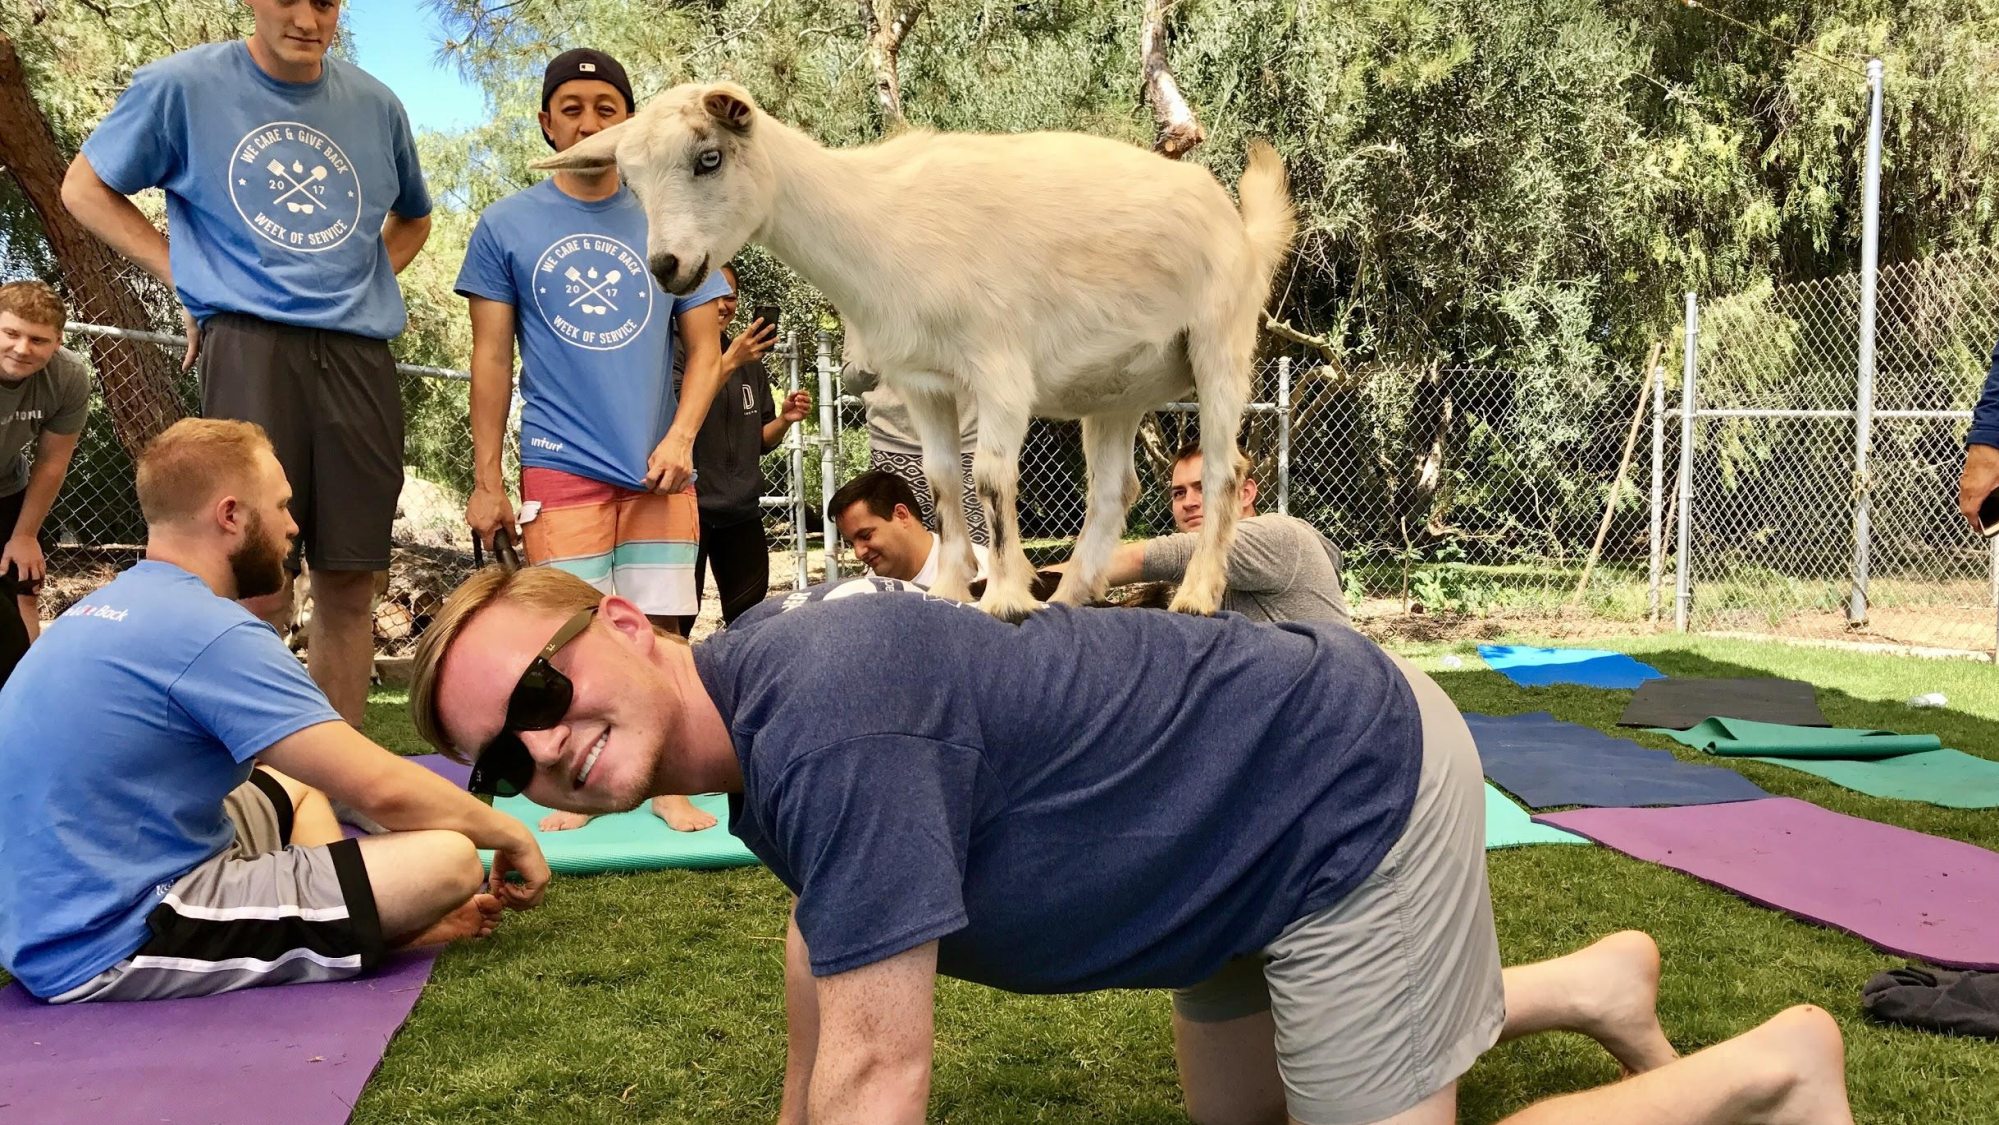 Goat Yoga - Intuit has a